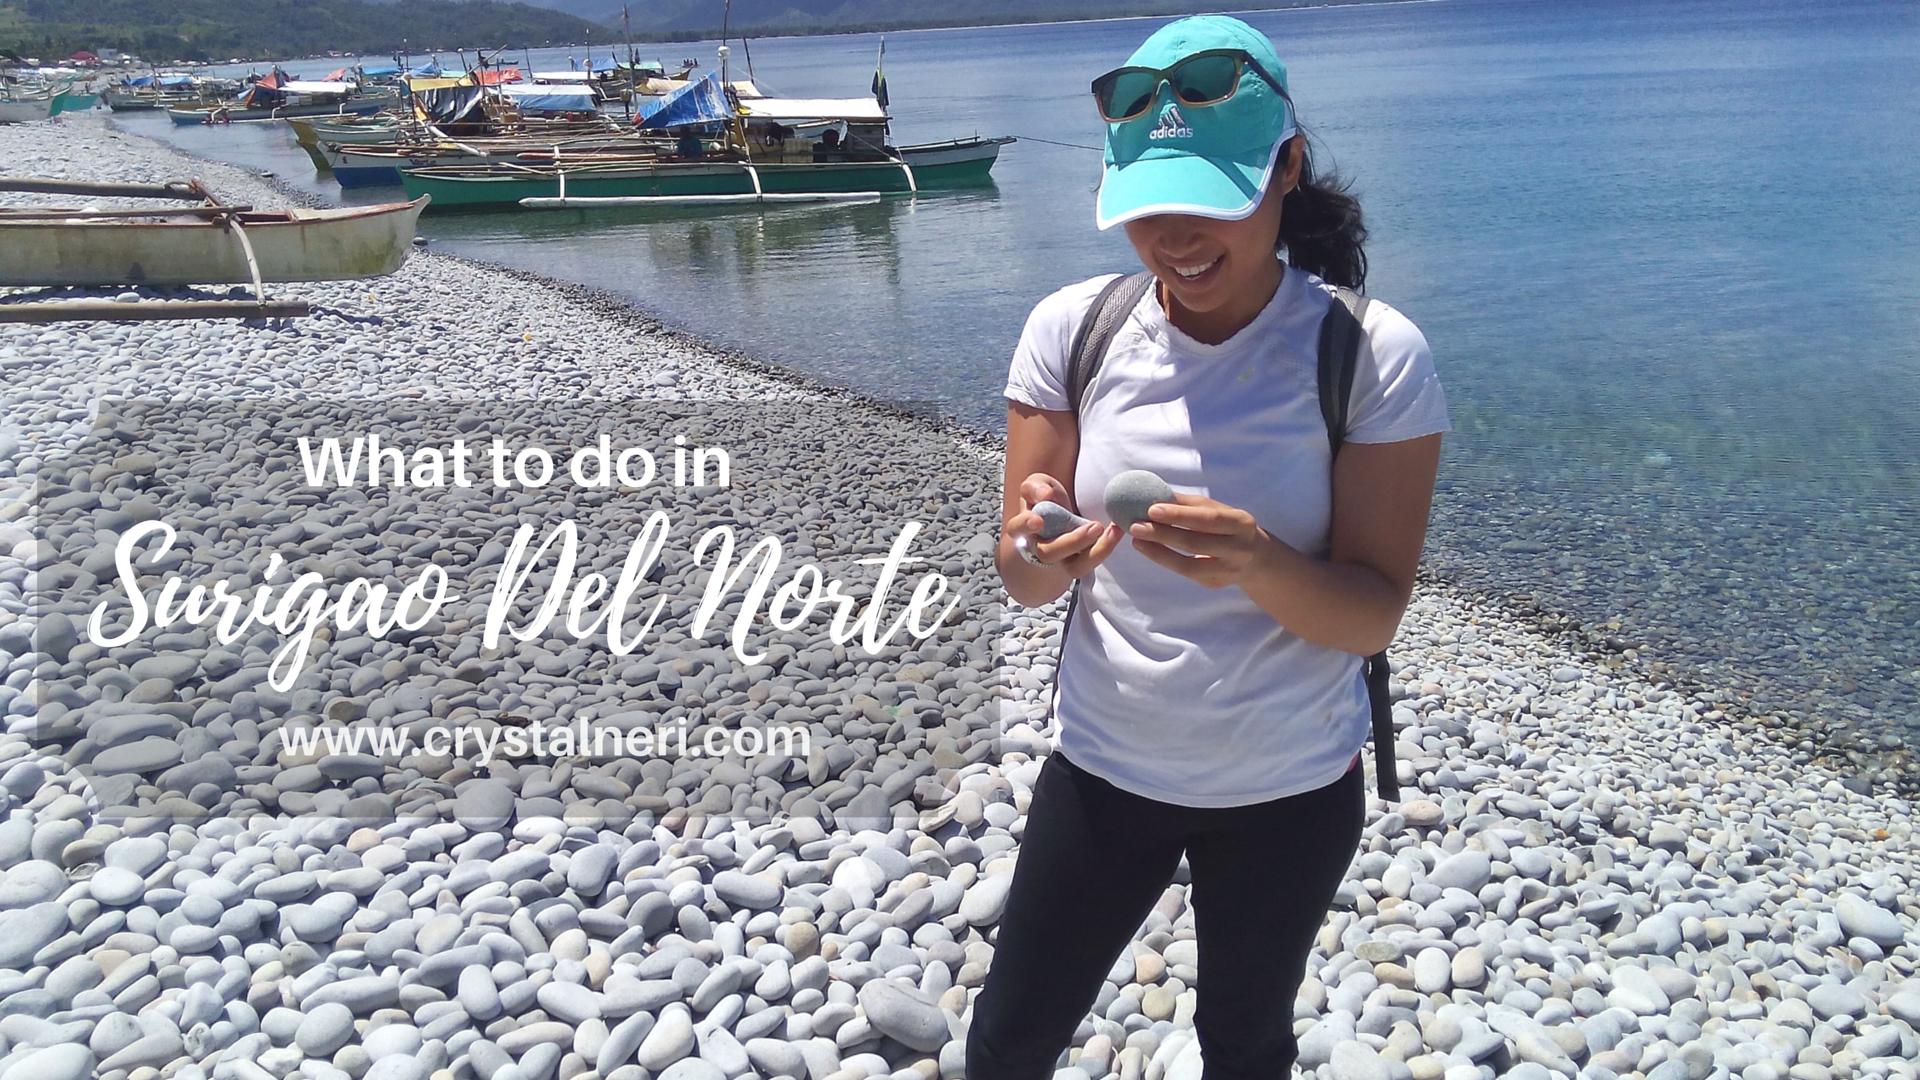 surigao-philippines-what-to-do